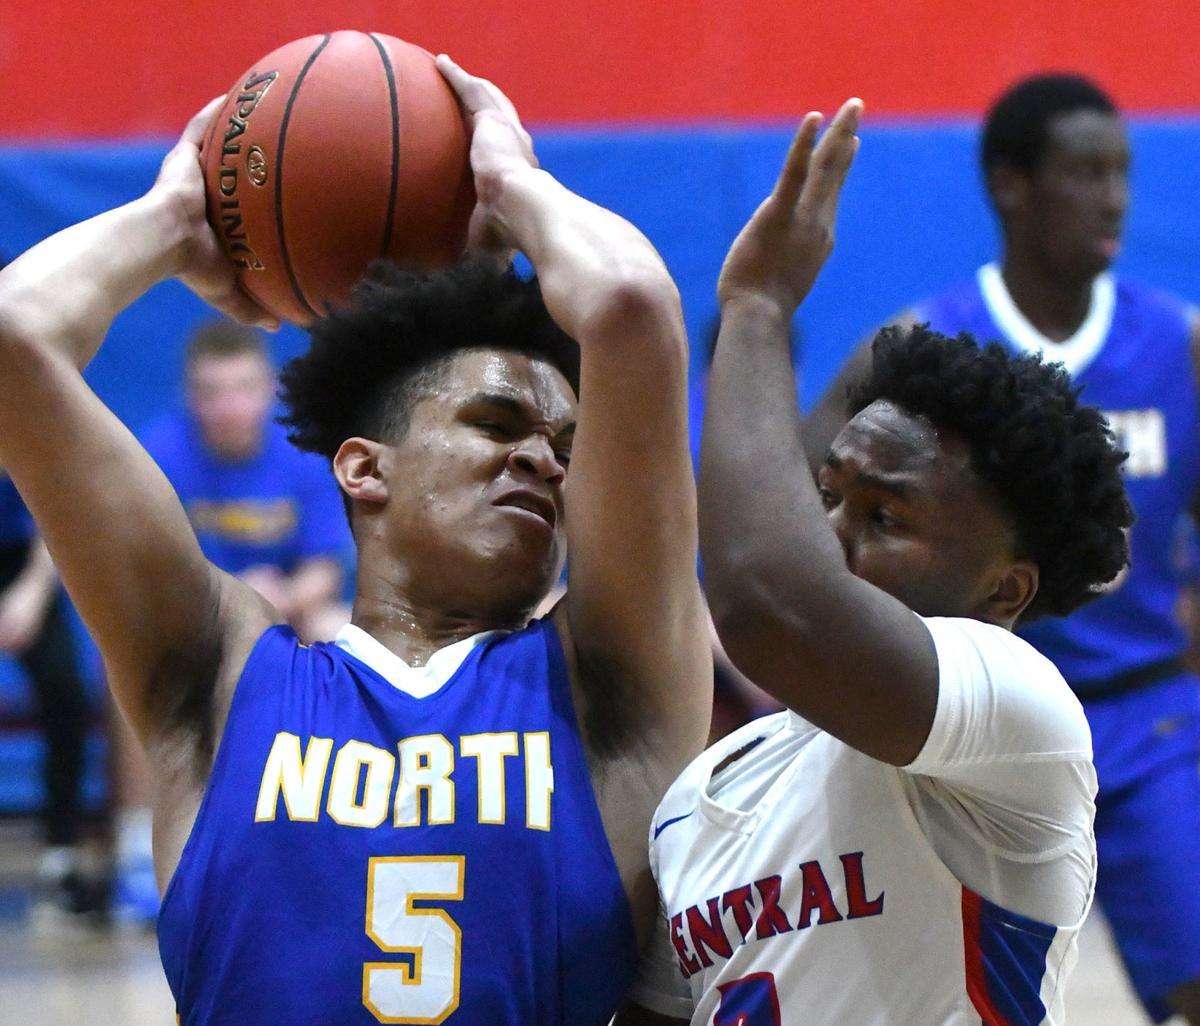 Davenport North vs Davenport Central boys basketball.